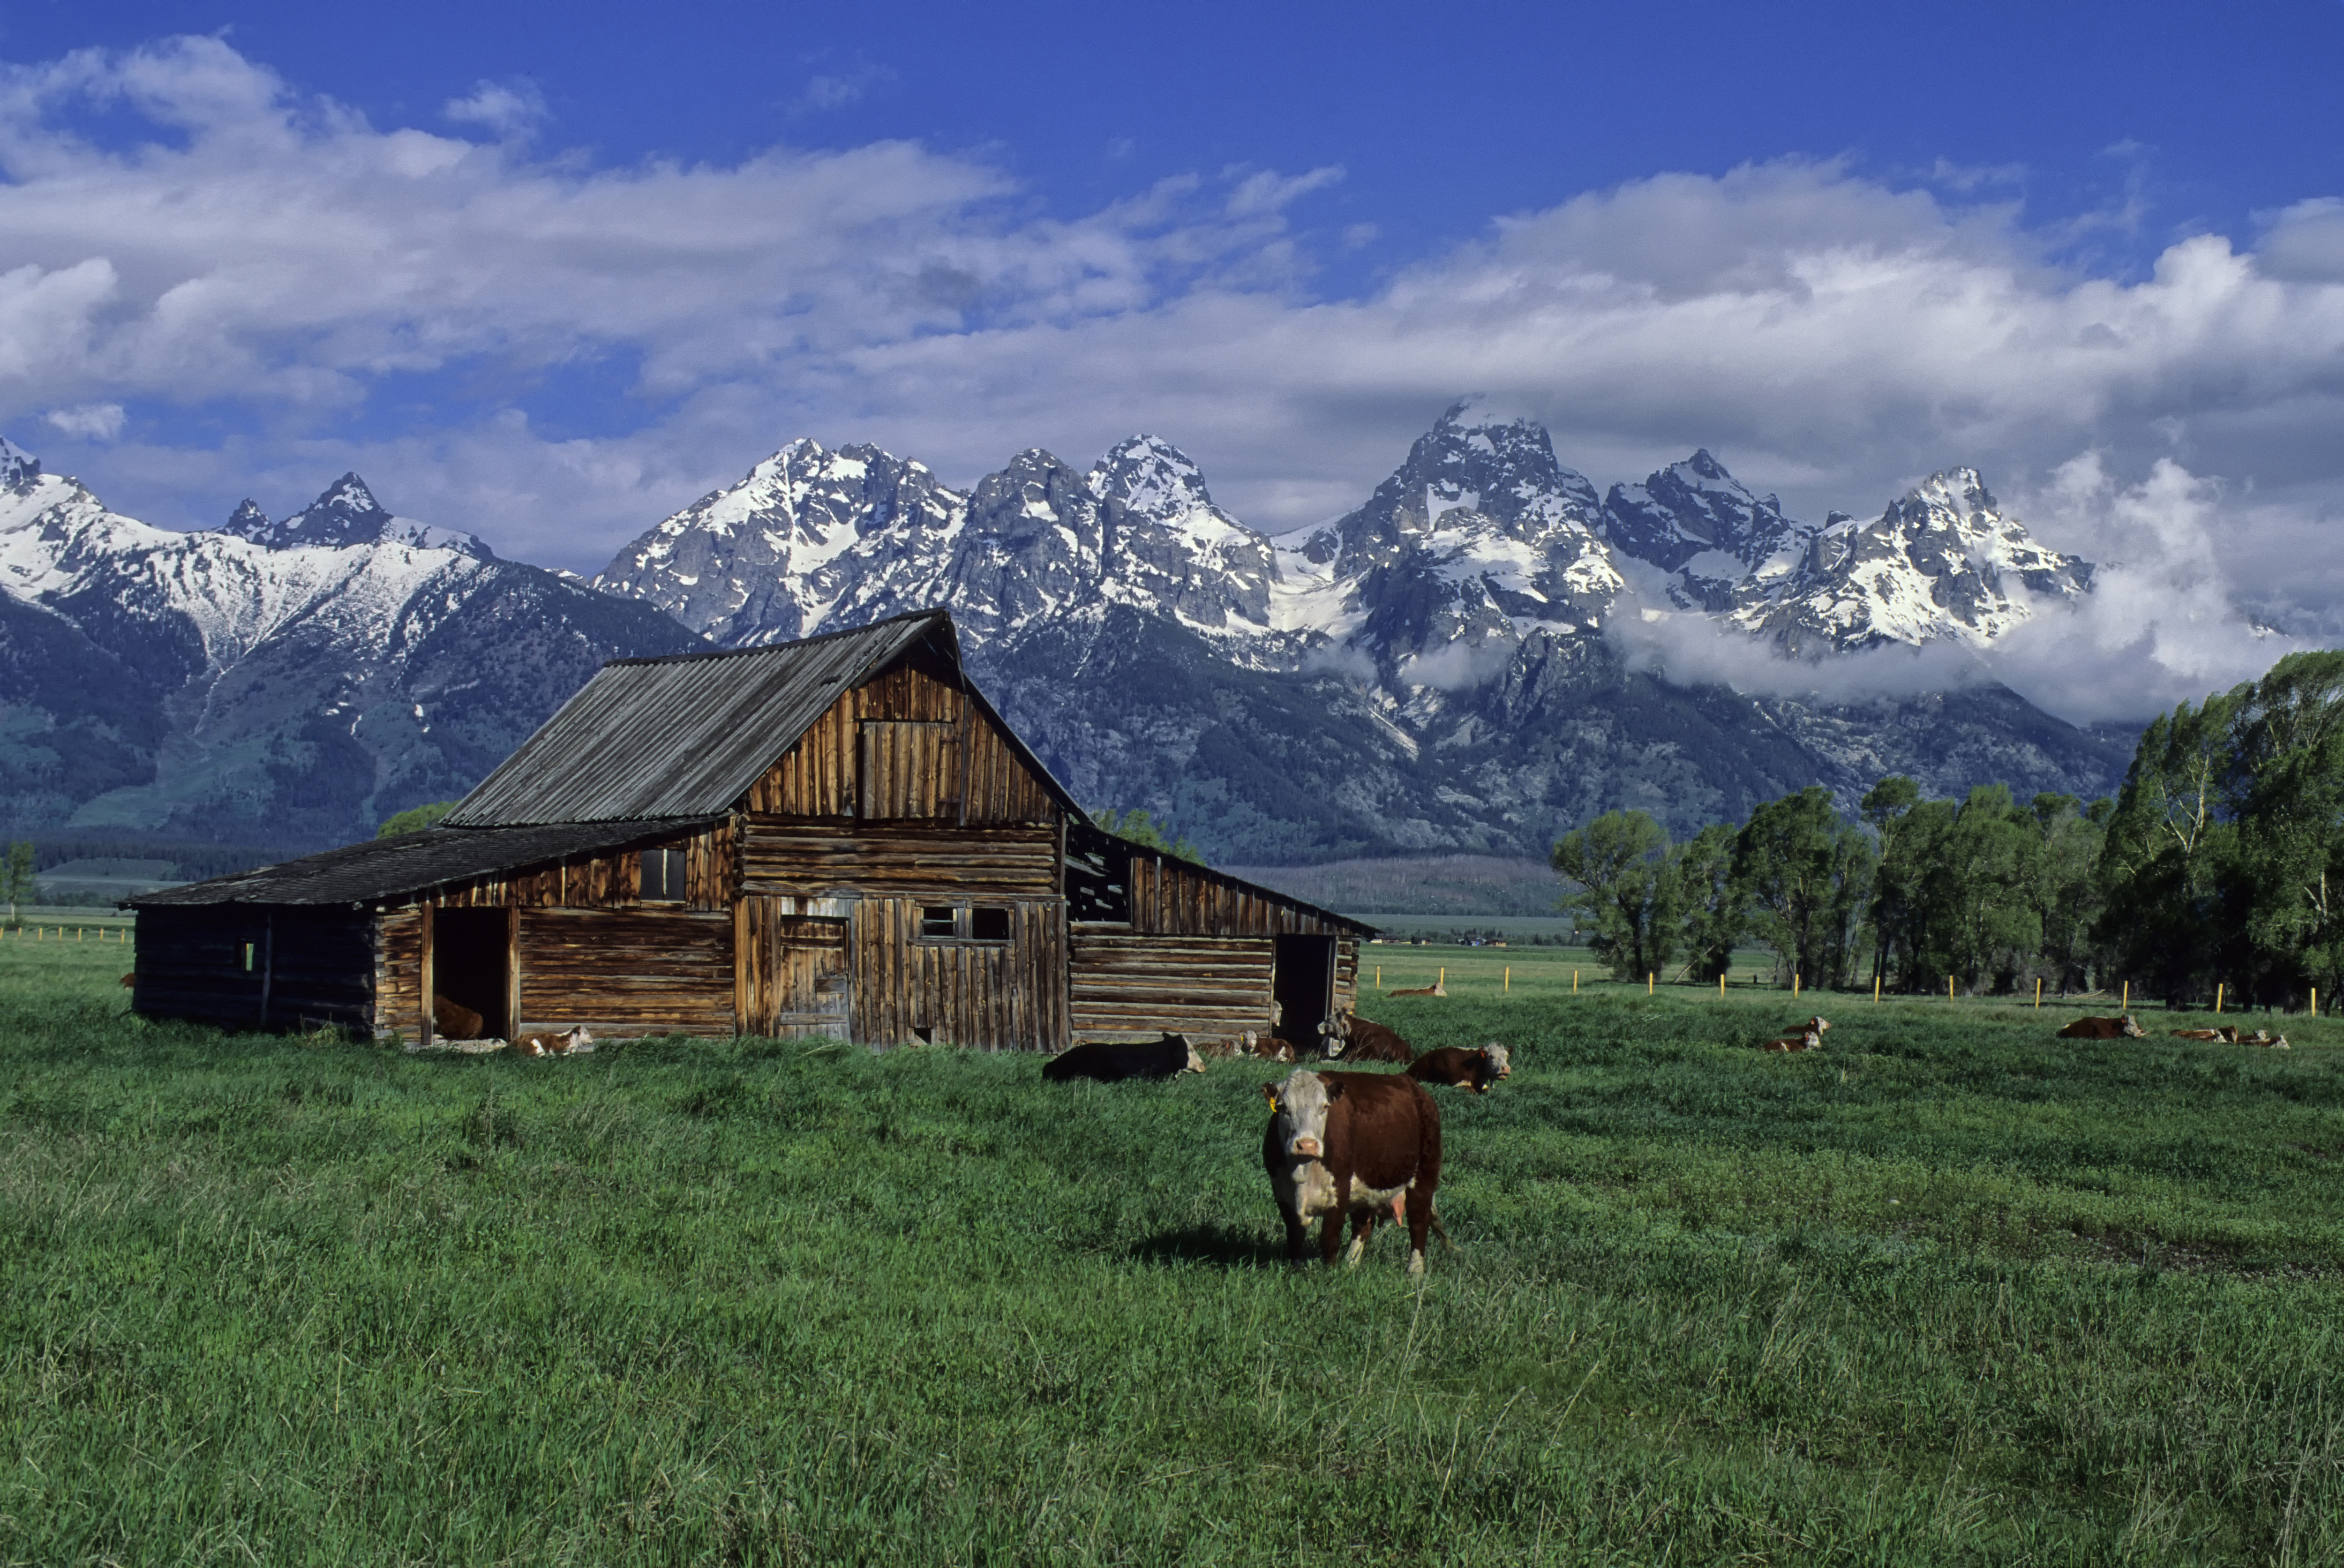 USA, Wyoming, Grand Teton National Park, Teton Range, Old...